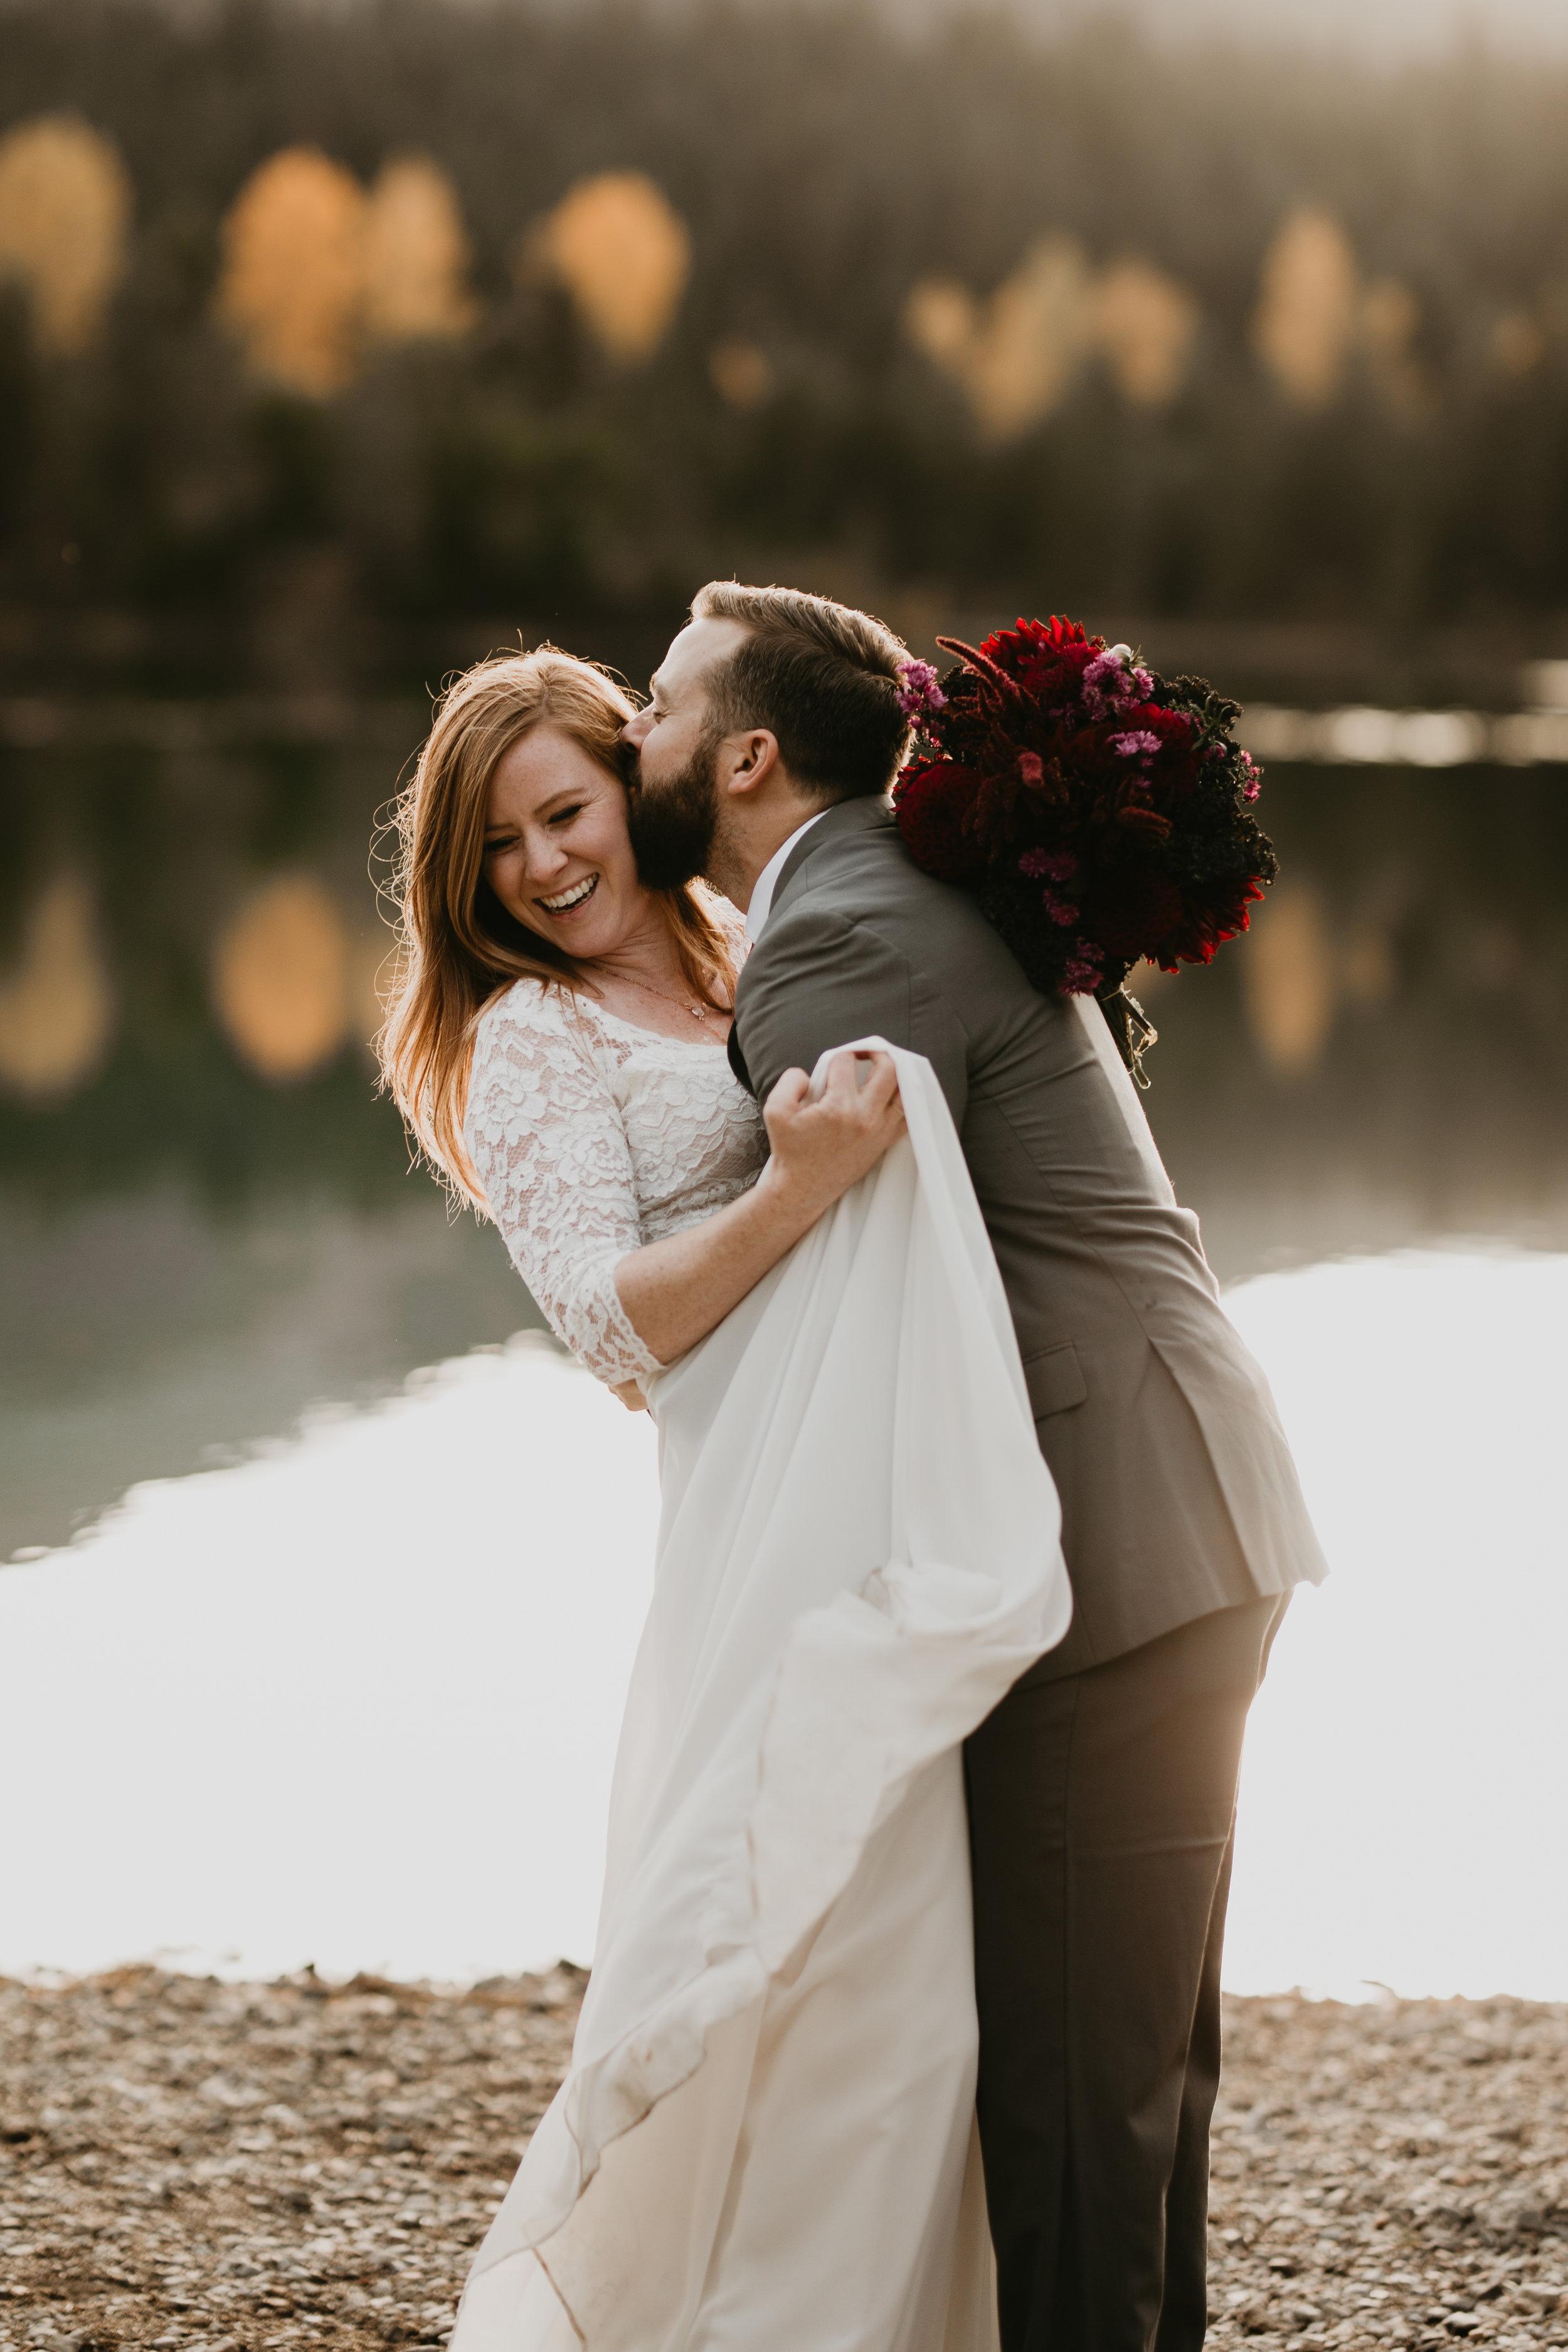 nicole-daacke-photography-mountain-view-elopement-at-gold-creek-pond-snoqualmie-washington-wa-elopement-photographer-photography-adventure-elopement-in-washington-fall-lakeside-golden-sunset-boho-fun-bride-2761.jpg